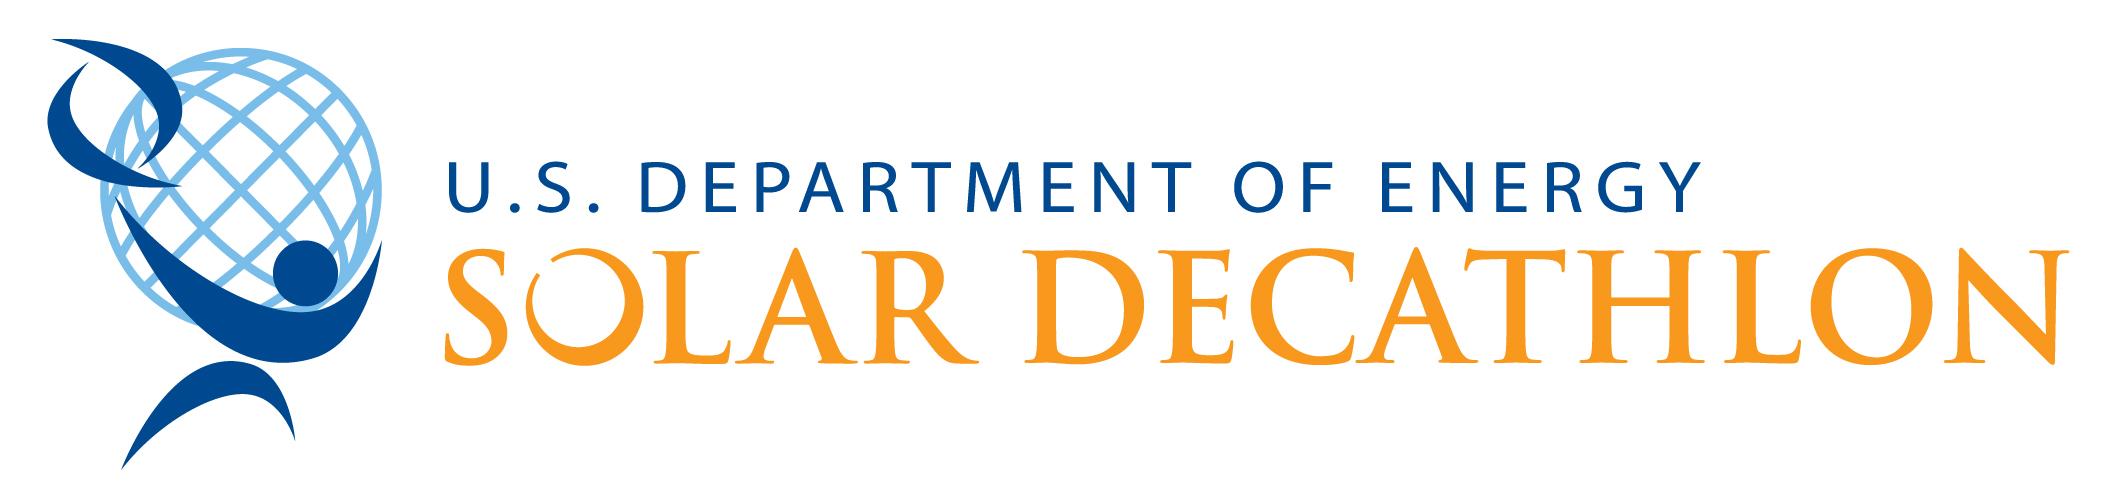 dc solar to sponsor us department of energy solar